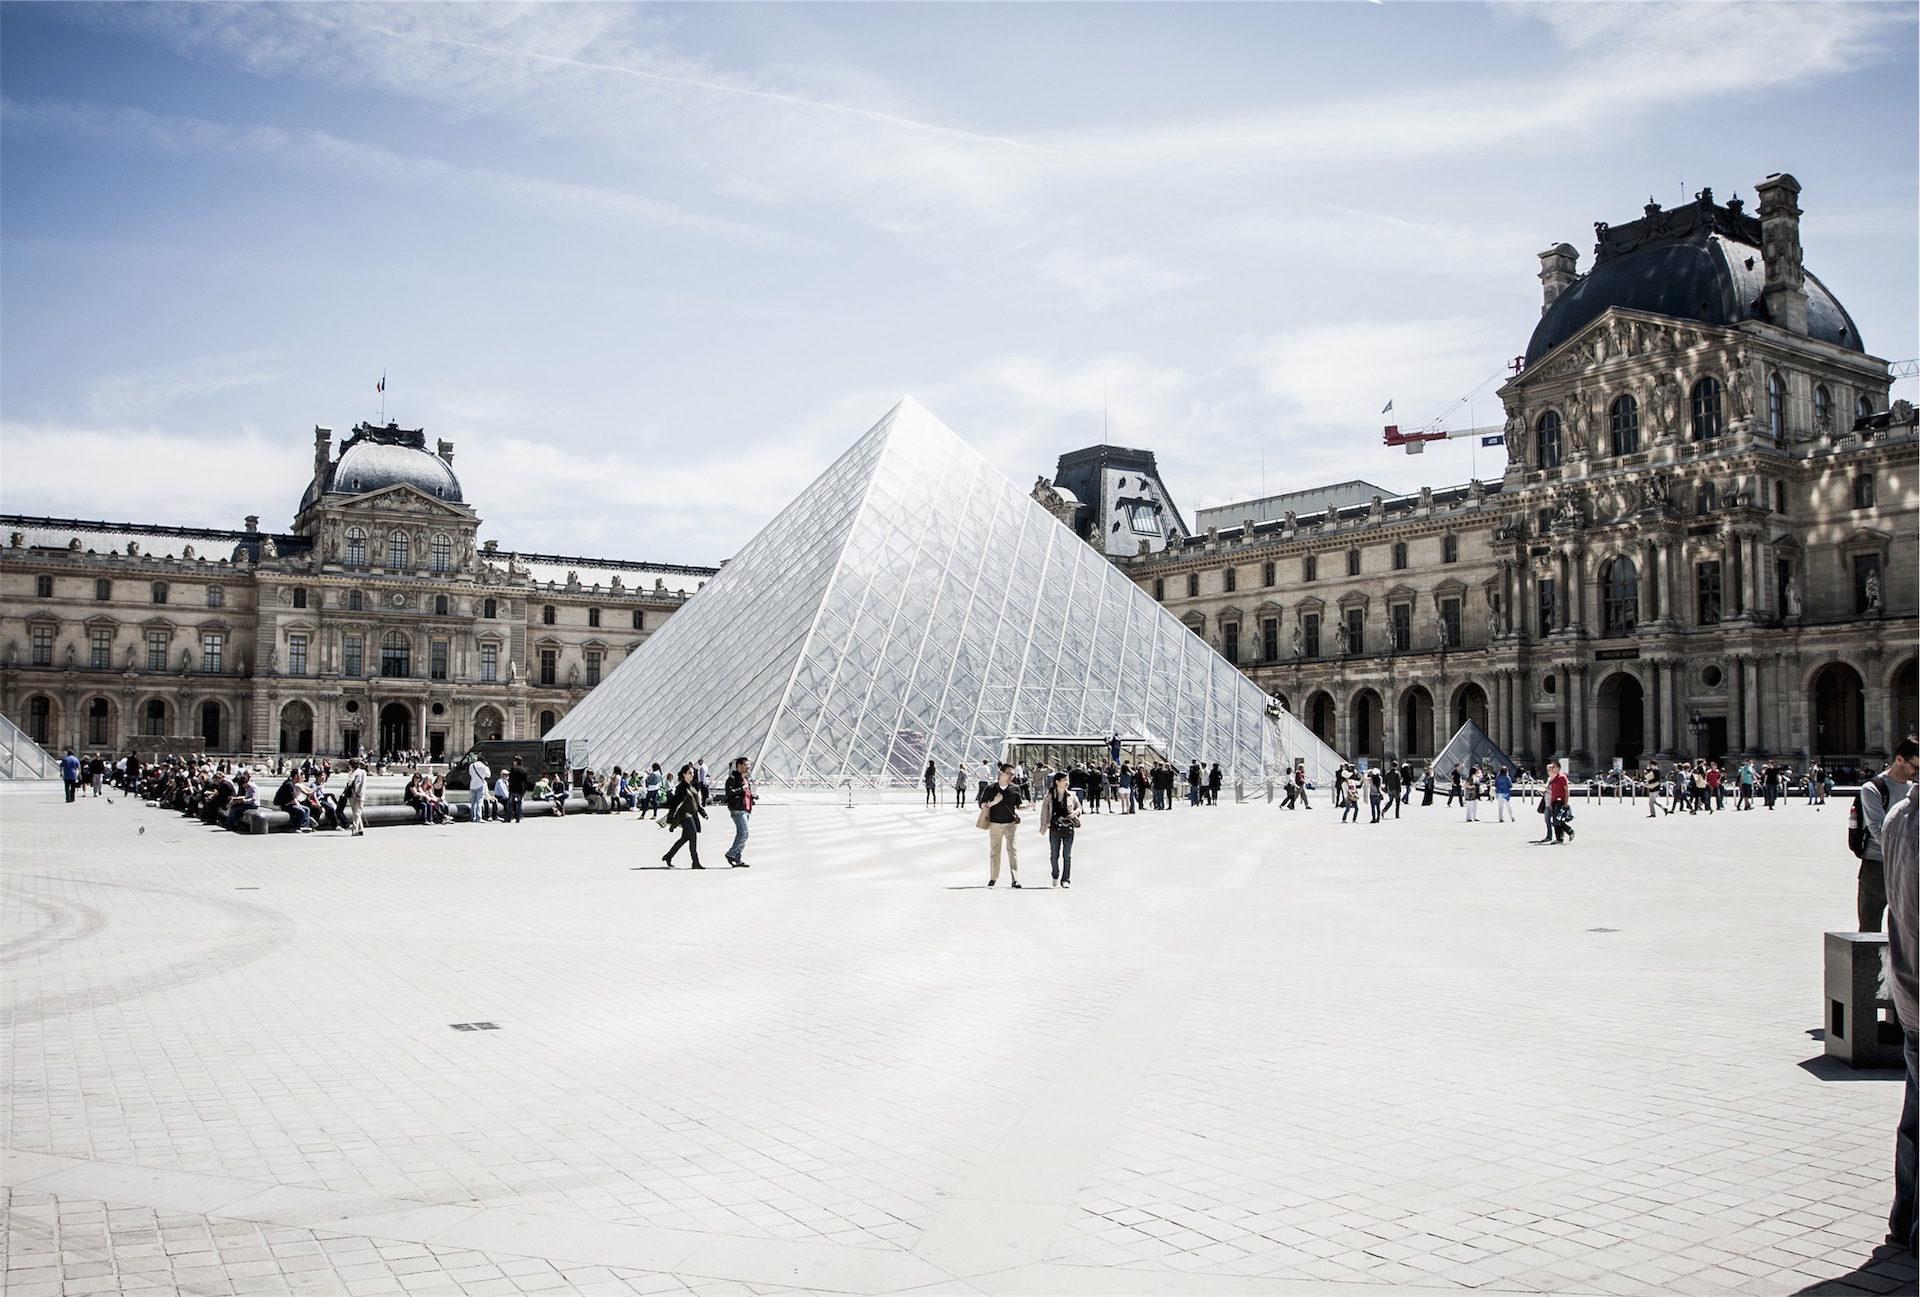 Пирамида, Музей, Париж, Лувр, Туризм, Франция - Обои HD - Профессор falken.com